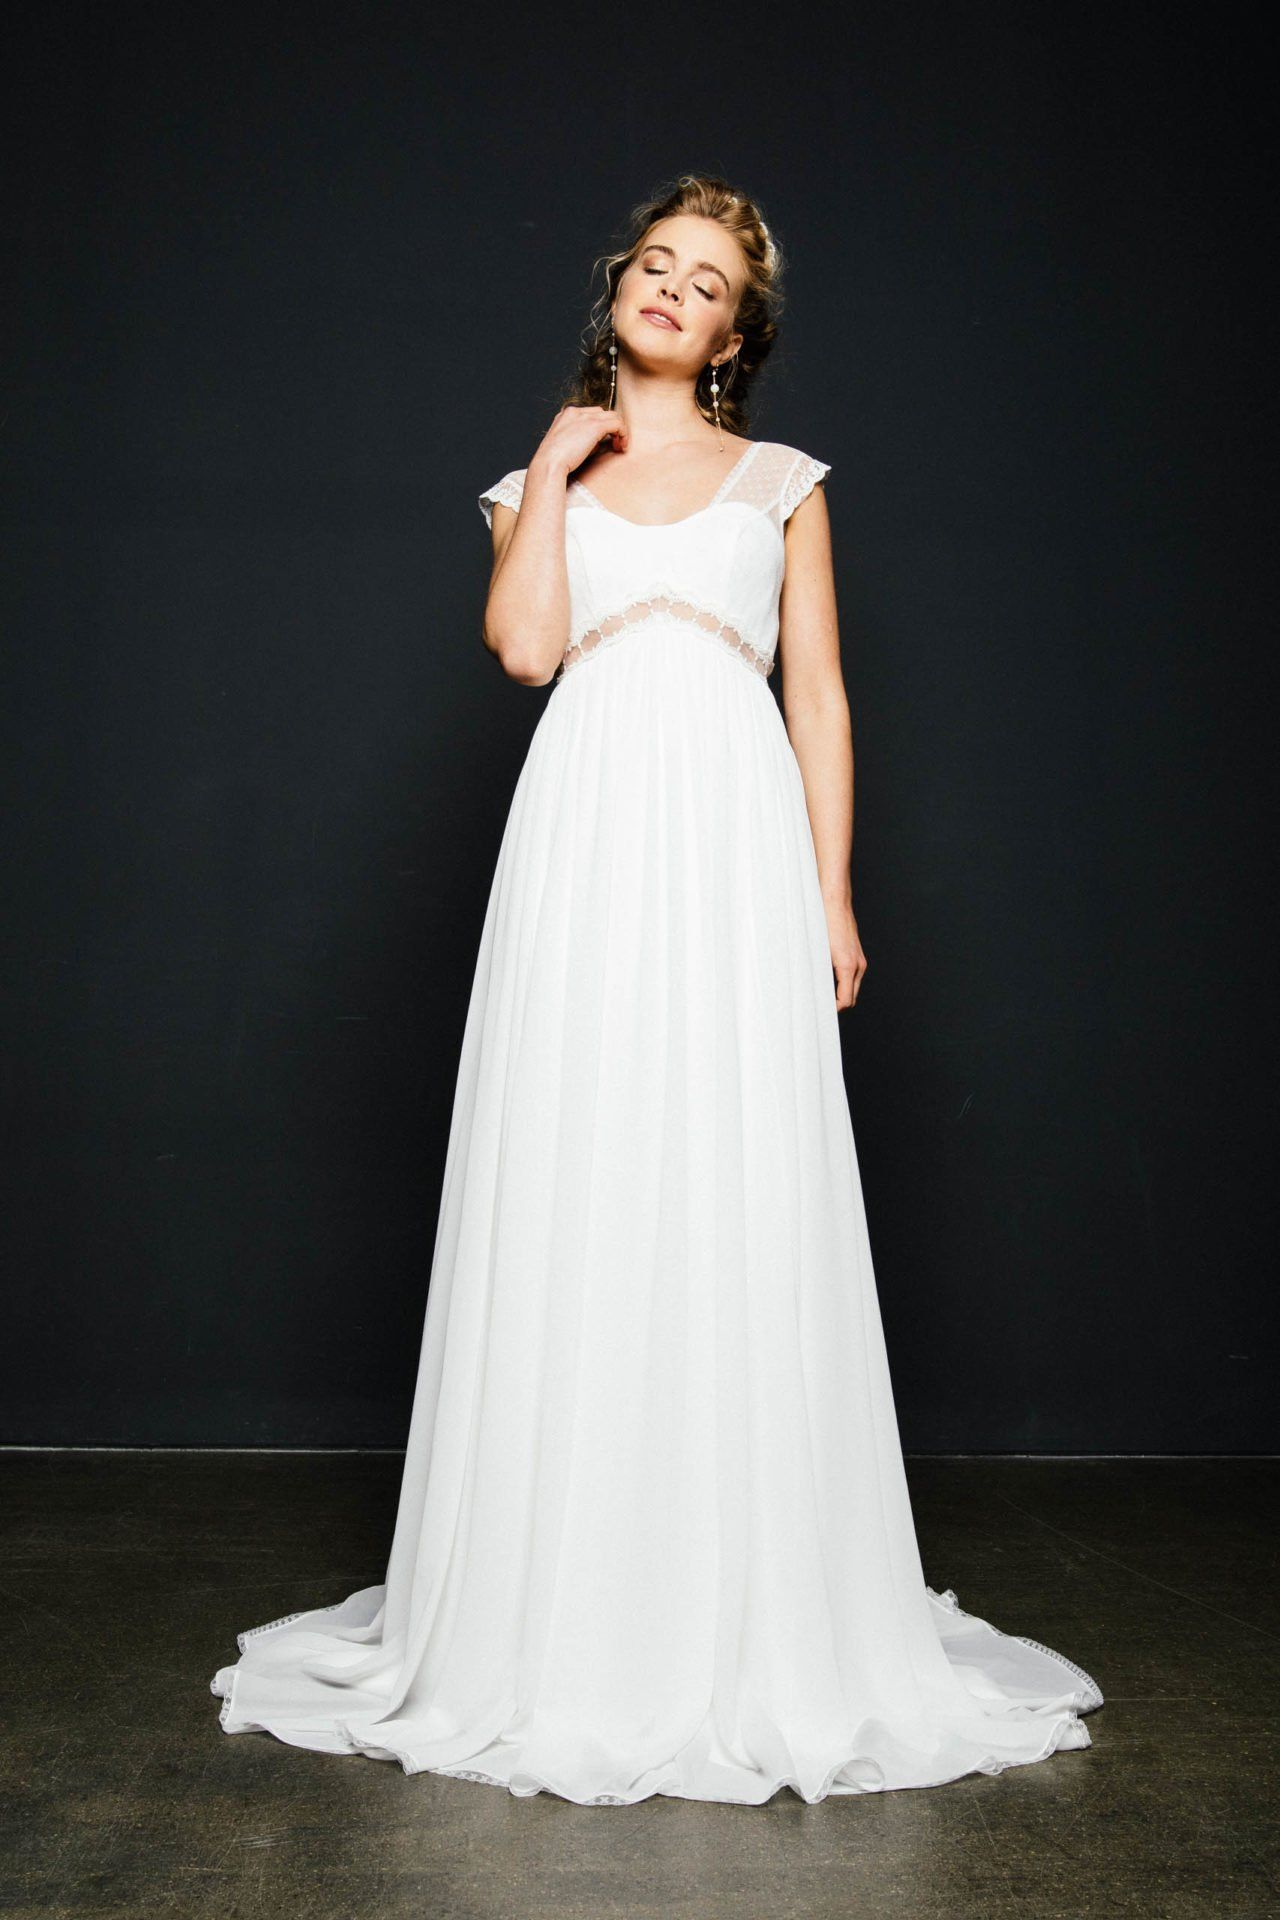 Empire Brautkleid in 17  Wedding dresses, Dresses, Boho wedding